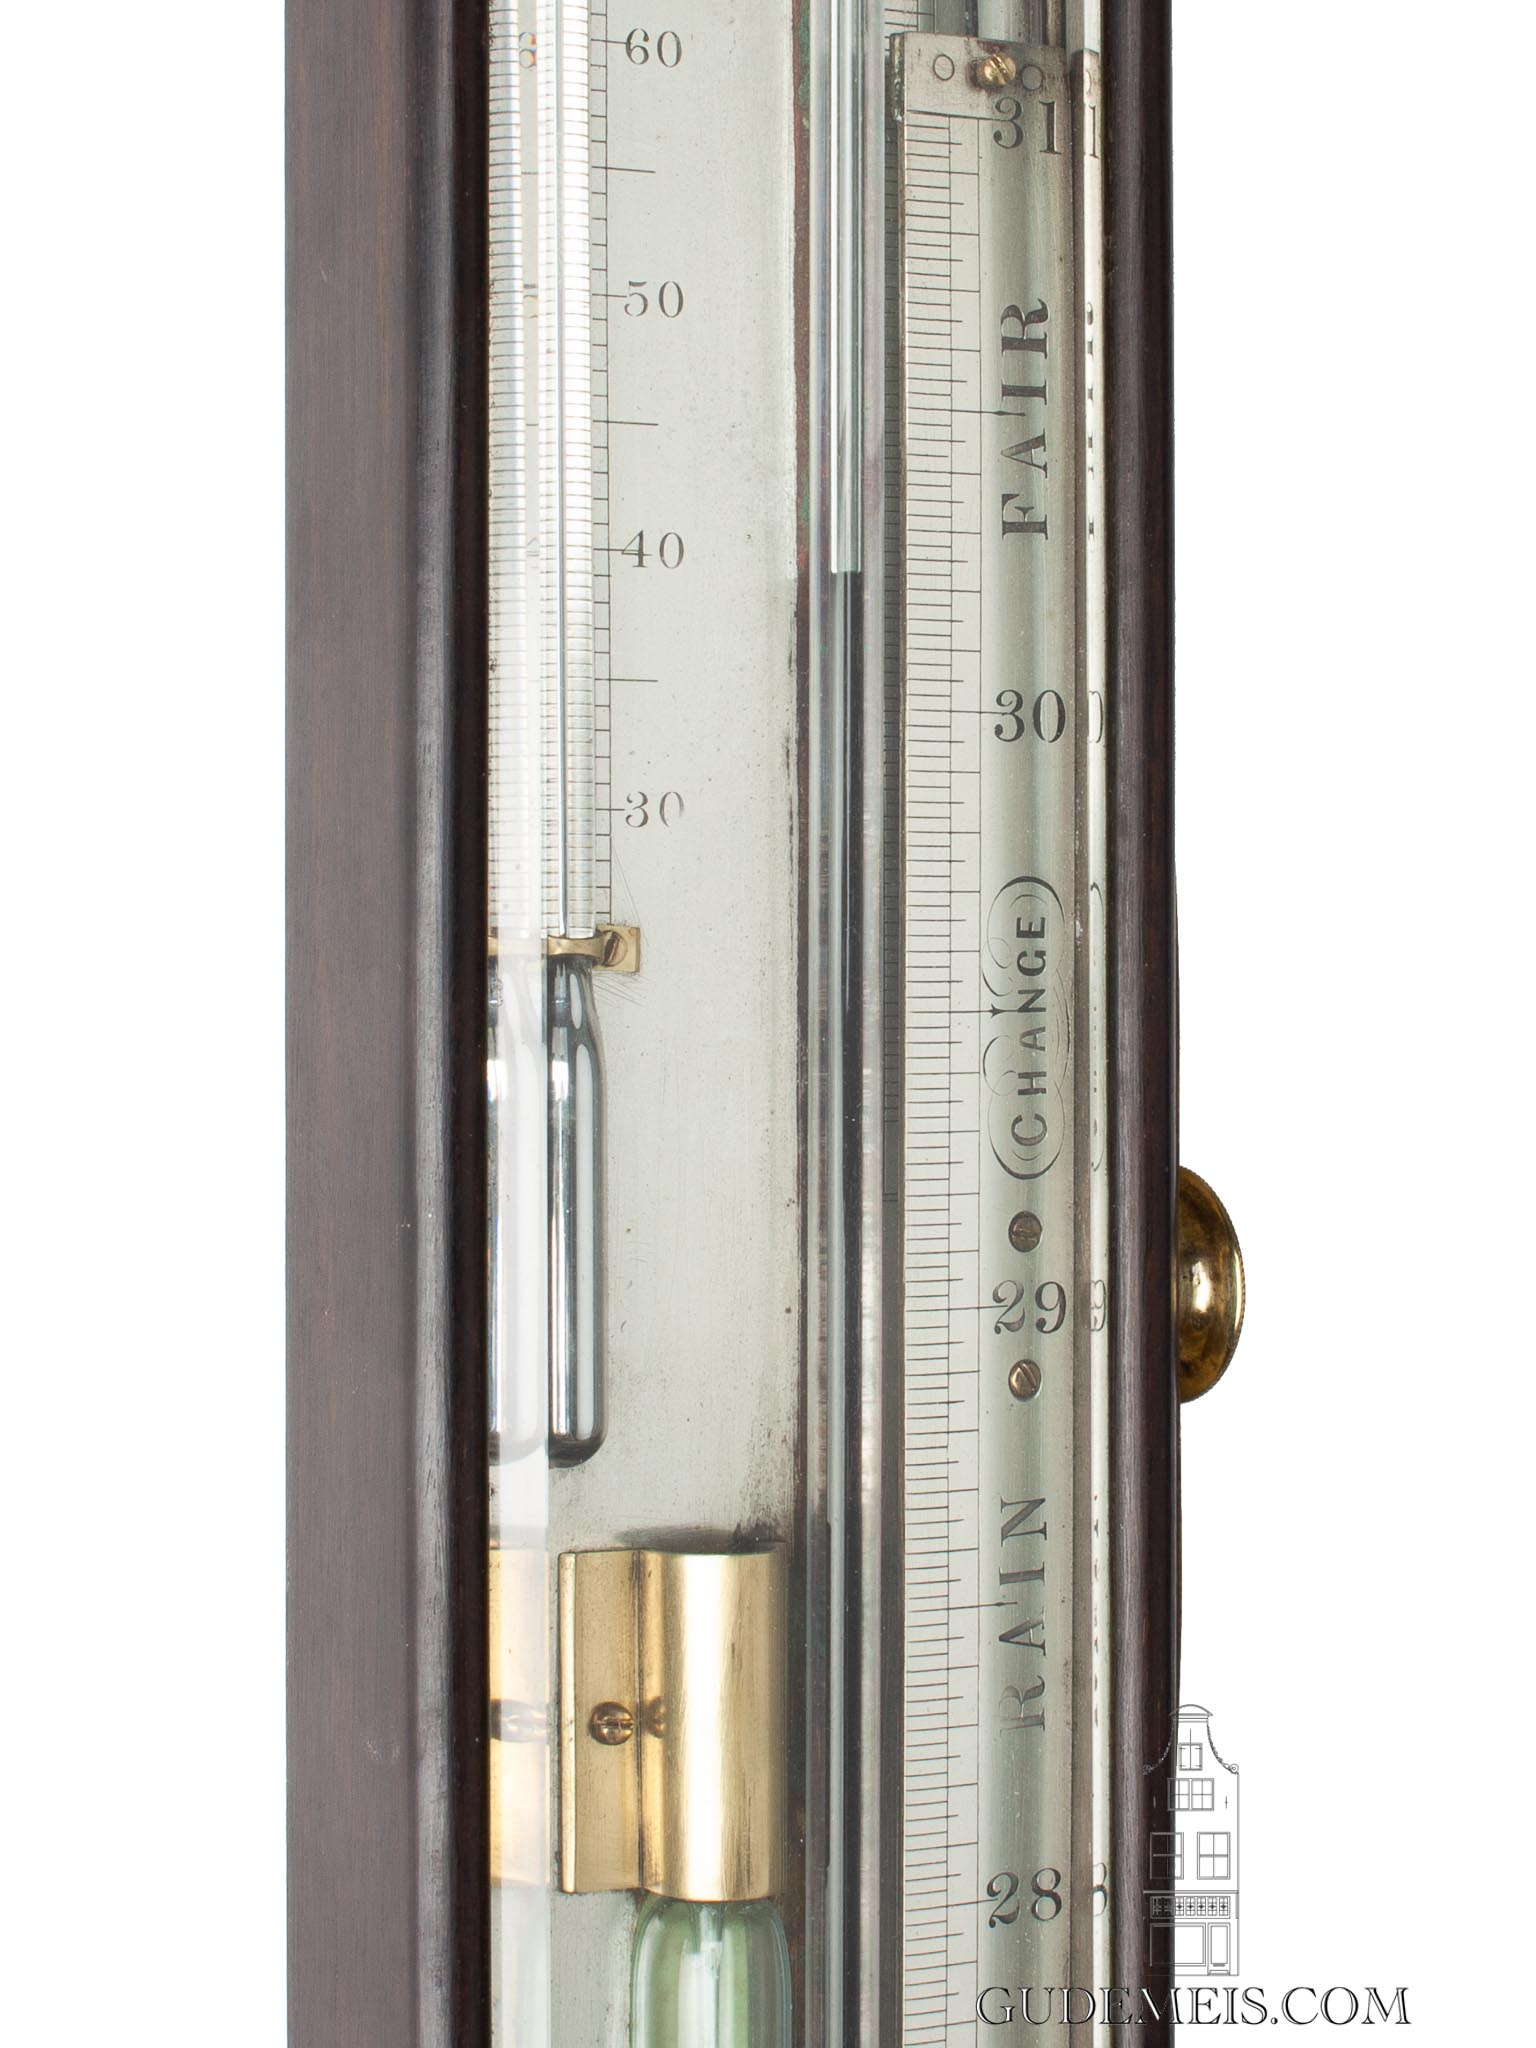 English-Adie-mahogany-marine-thermo-barometer-sympiesometer-mahogany-prenobscot-silvered-brass-plates-thermometer-